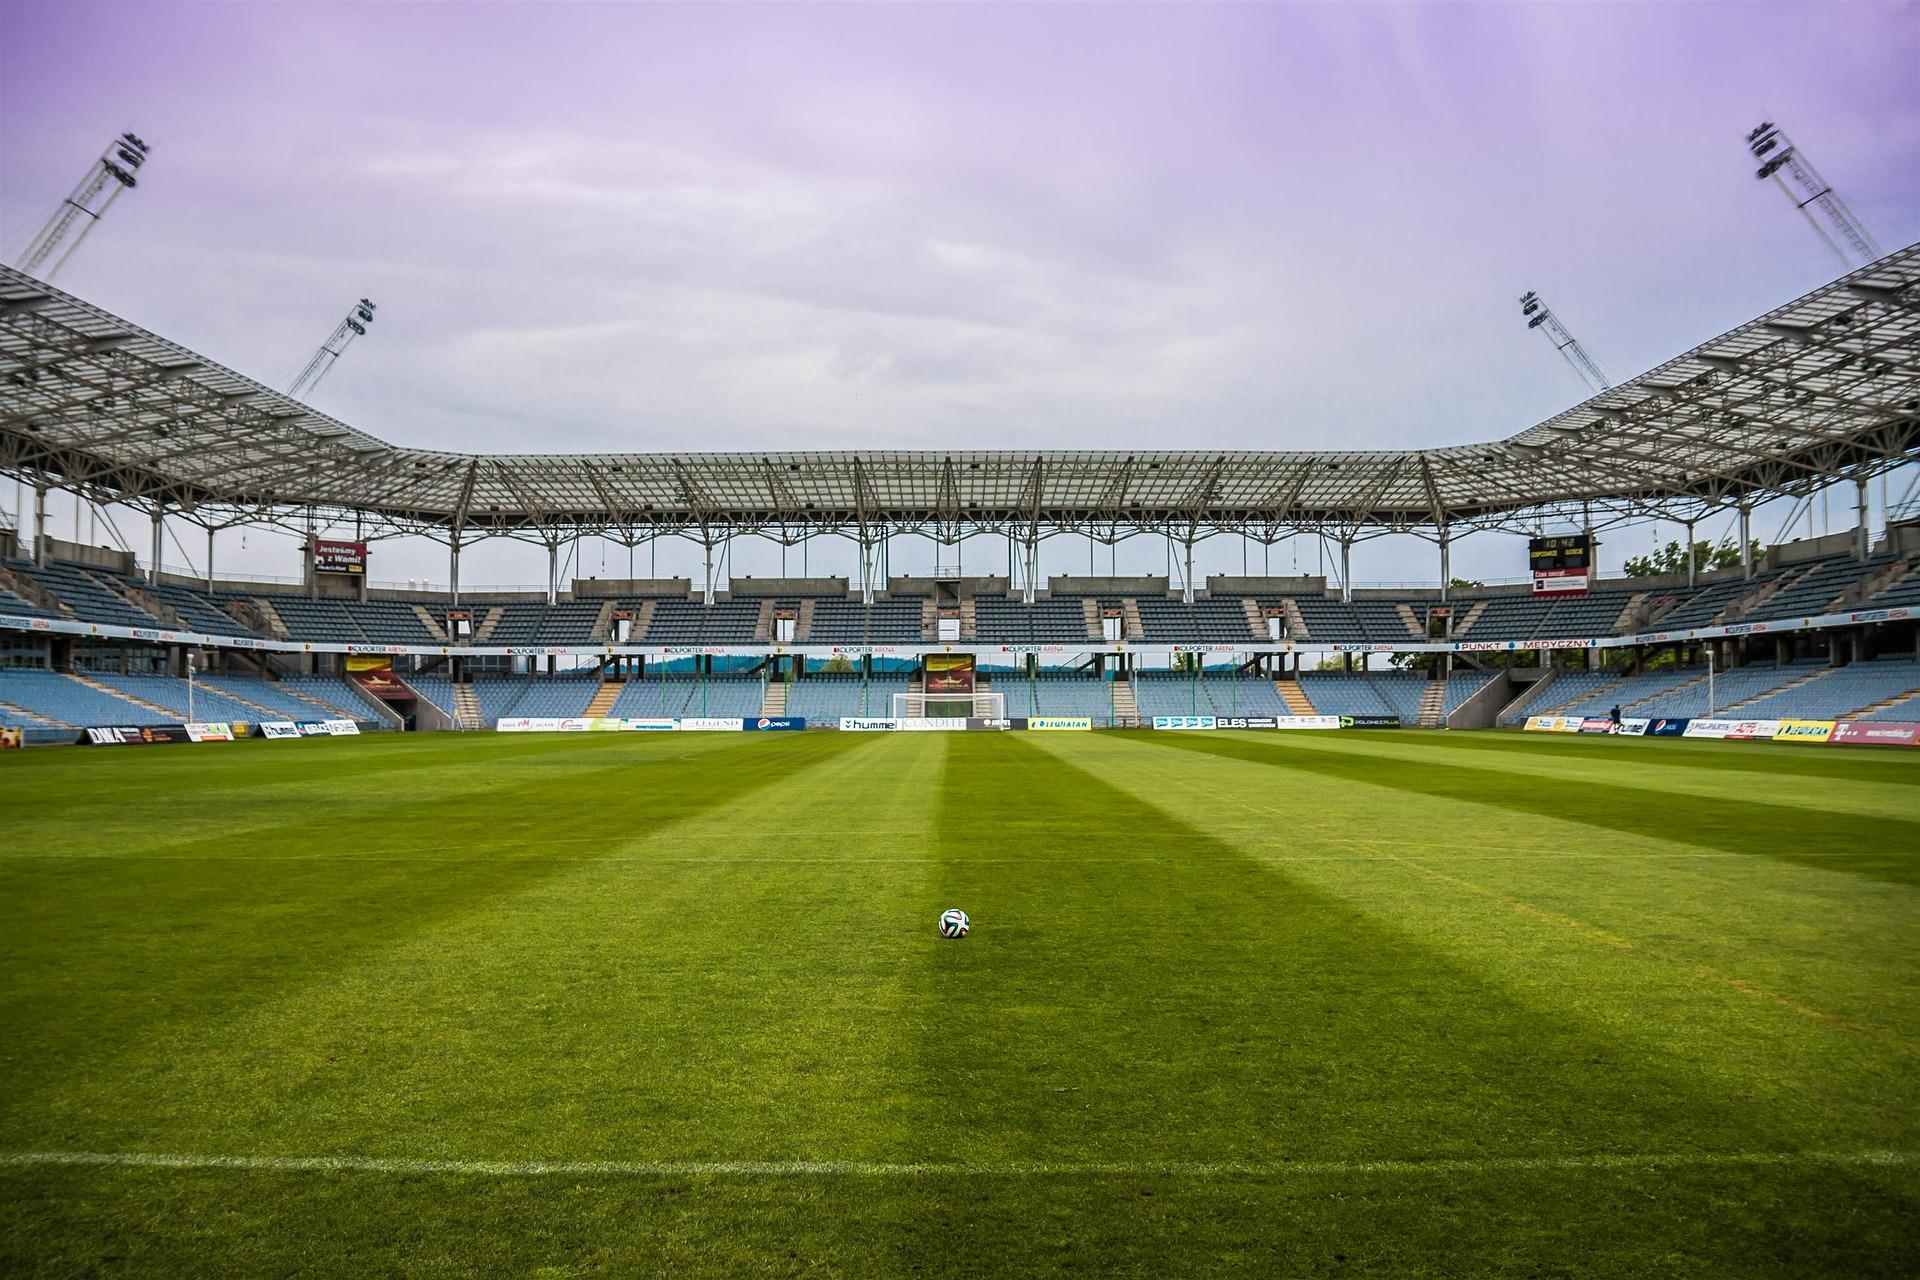 stadion-jaworzno